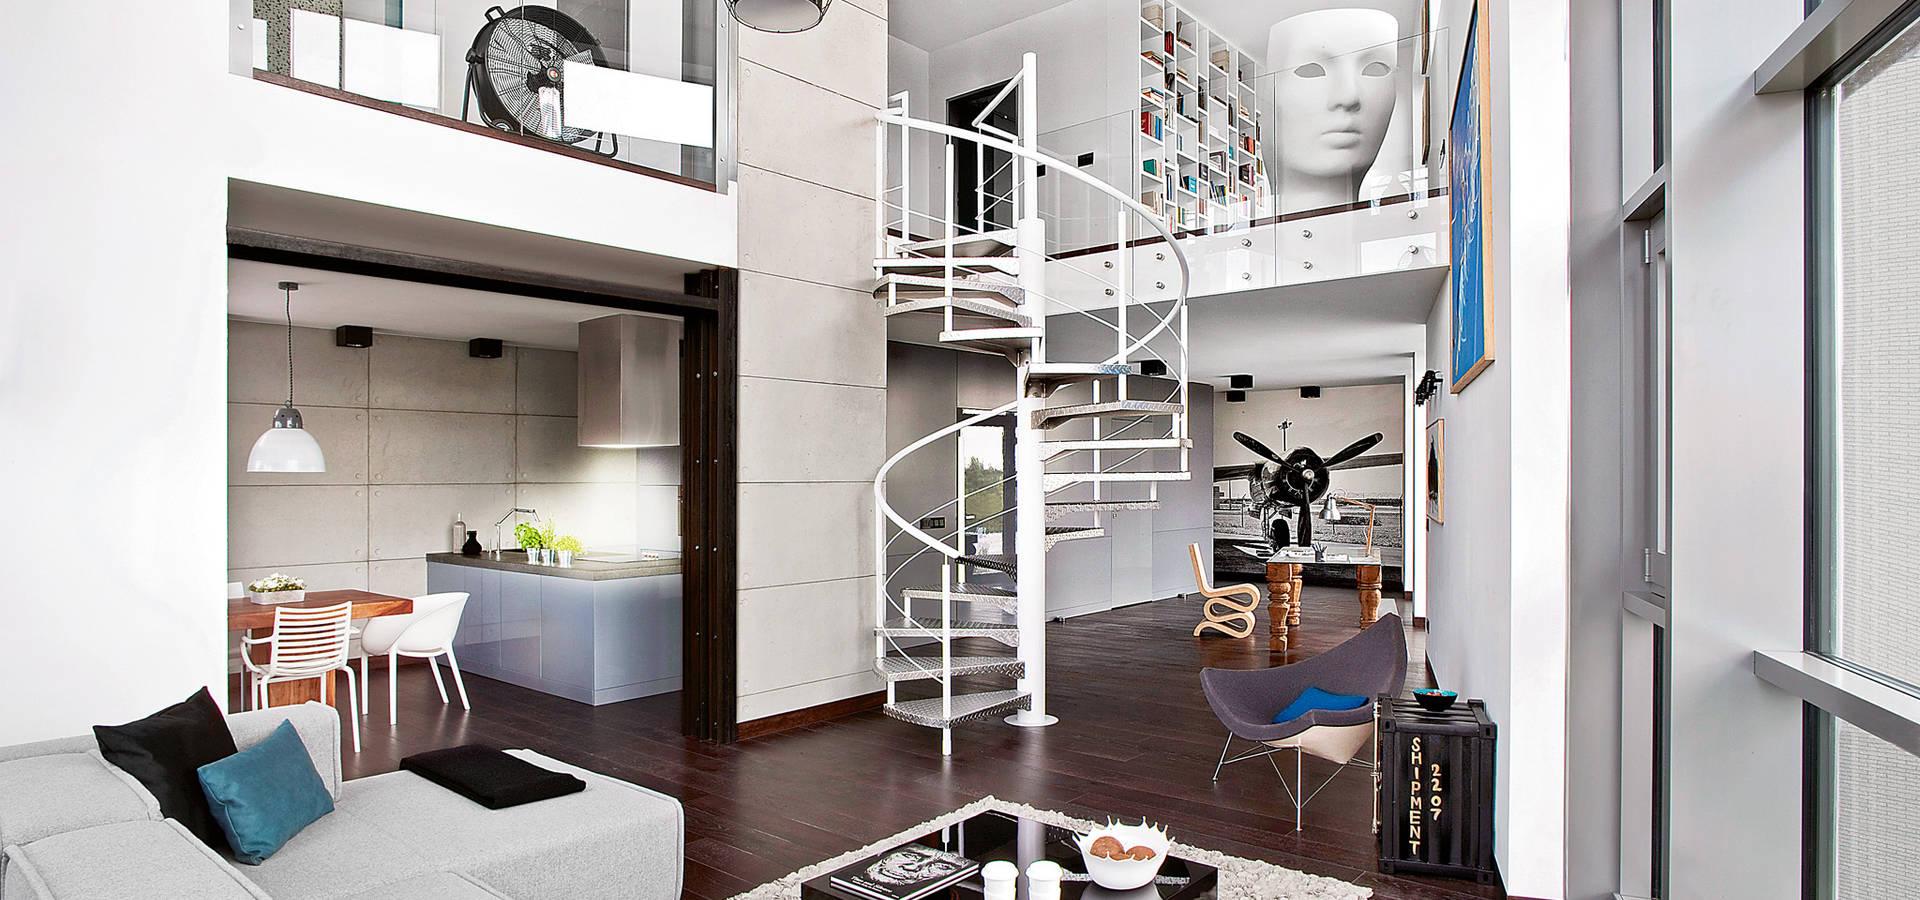 justyna smolec architektura & design